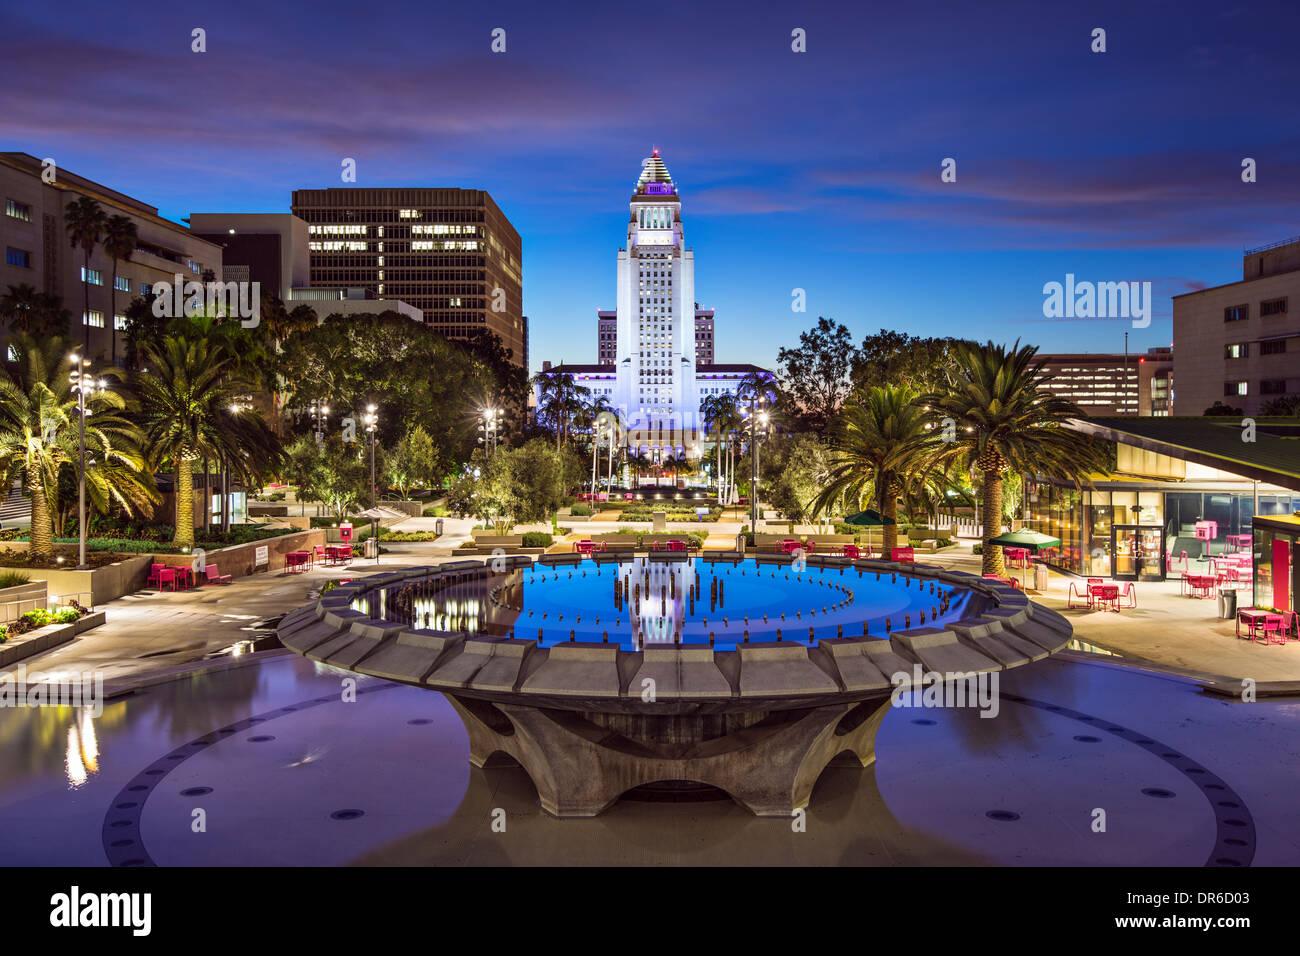 Los Angeles, Kalifornien am Rathaus. Stockbild